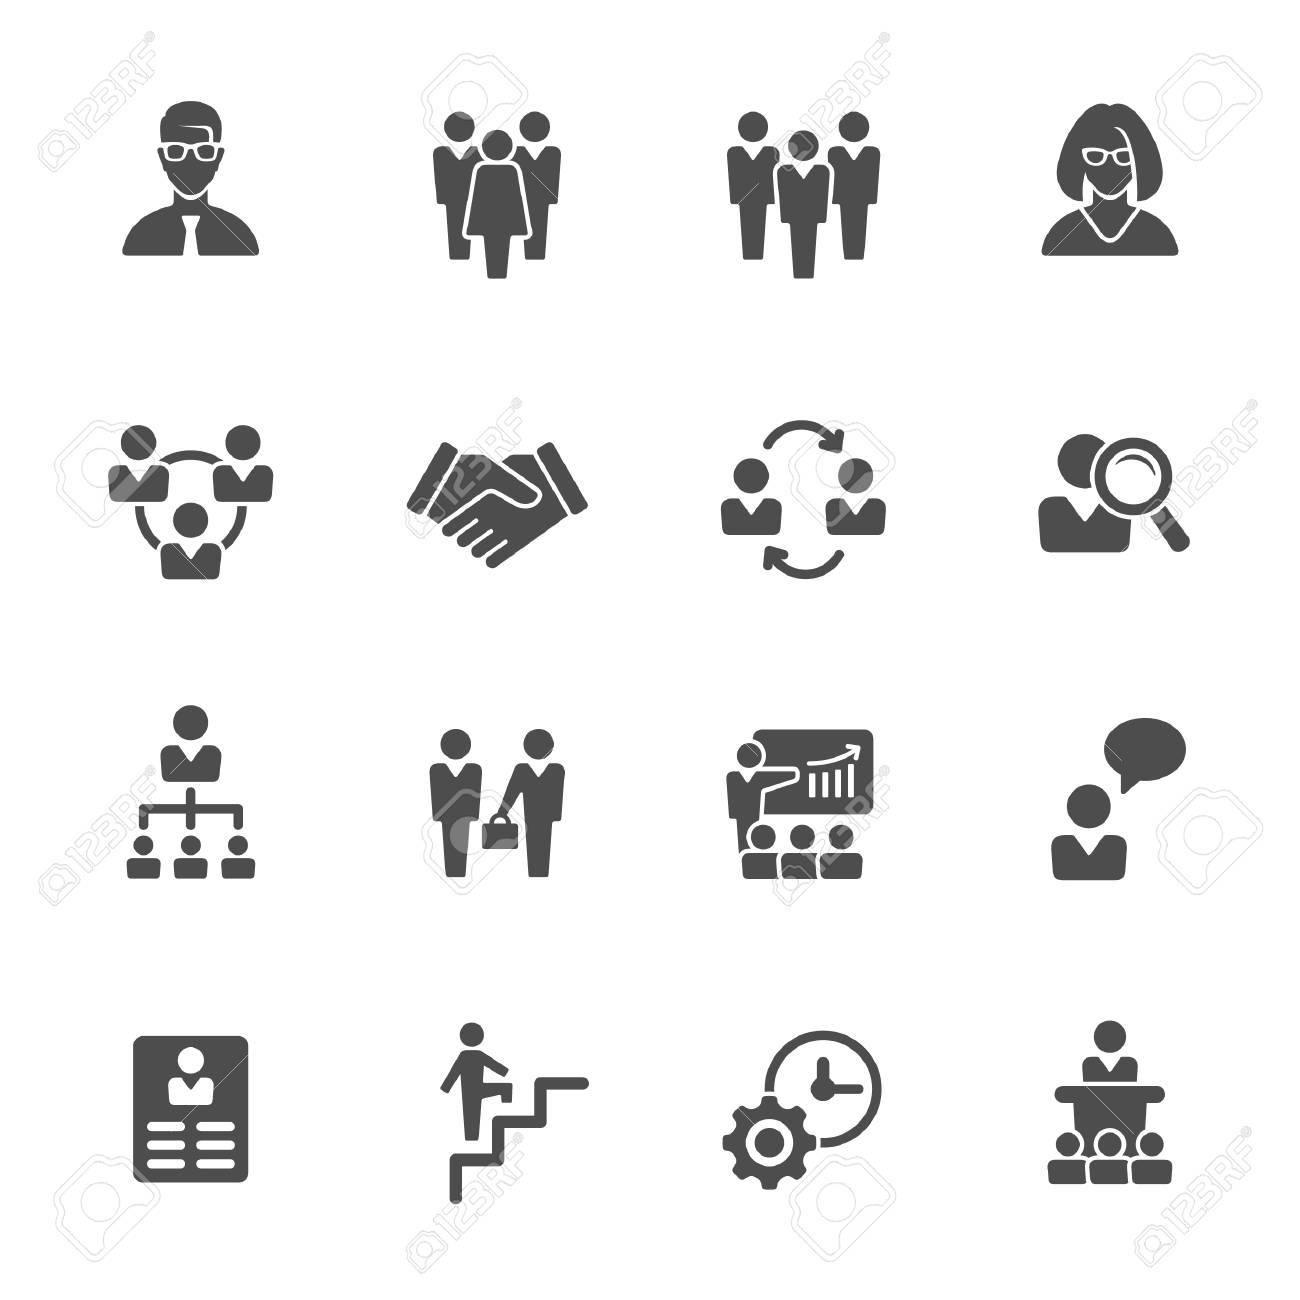 management icons - 53709236